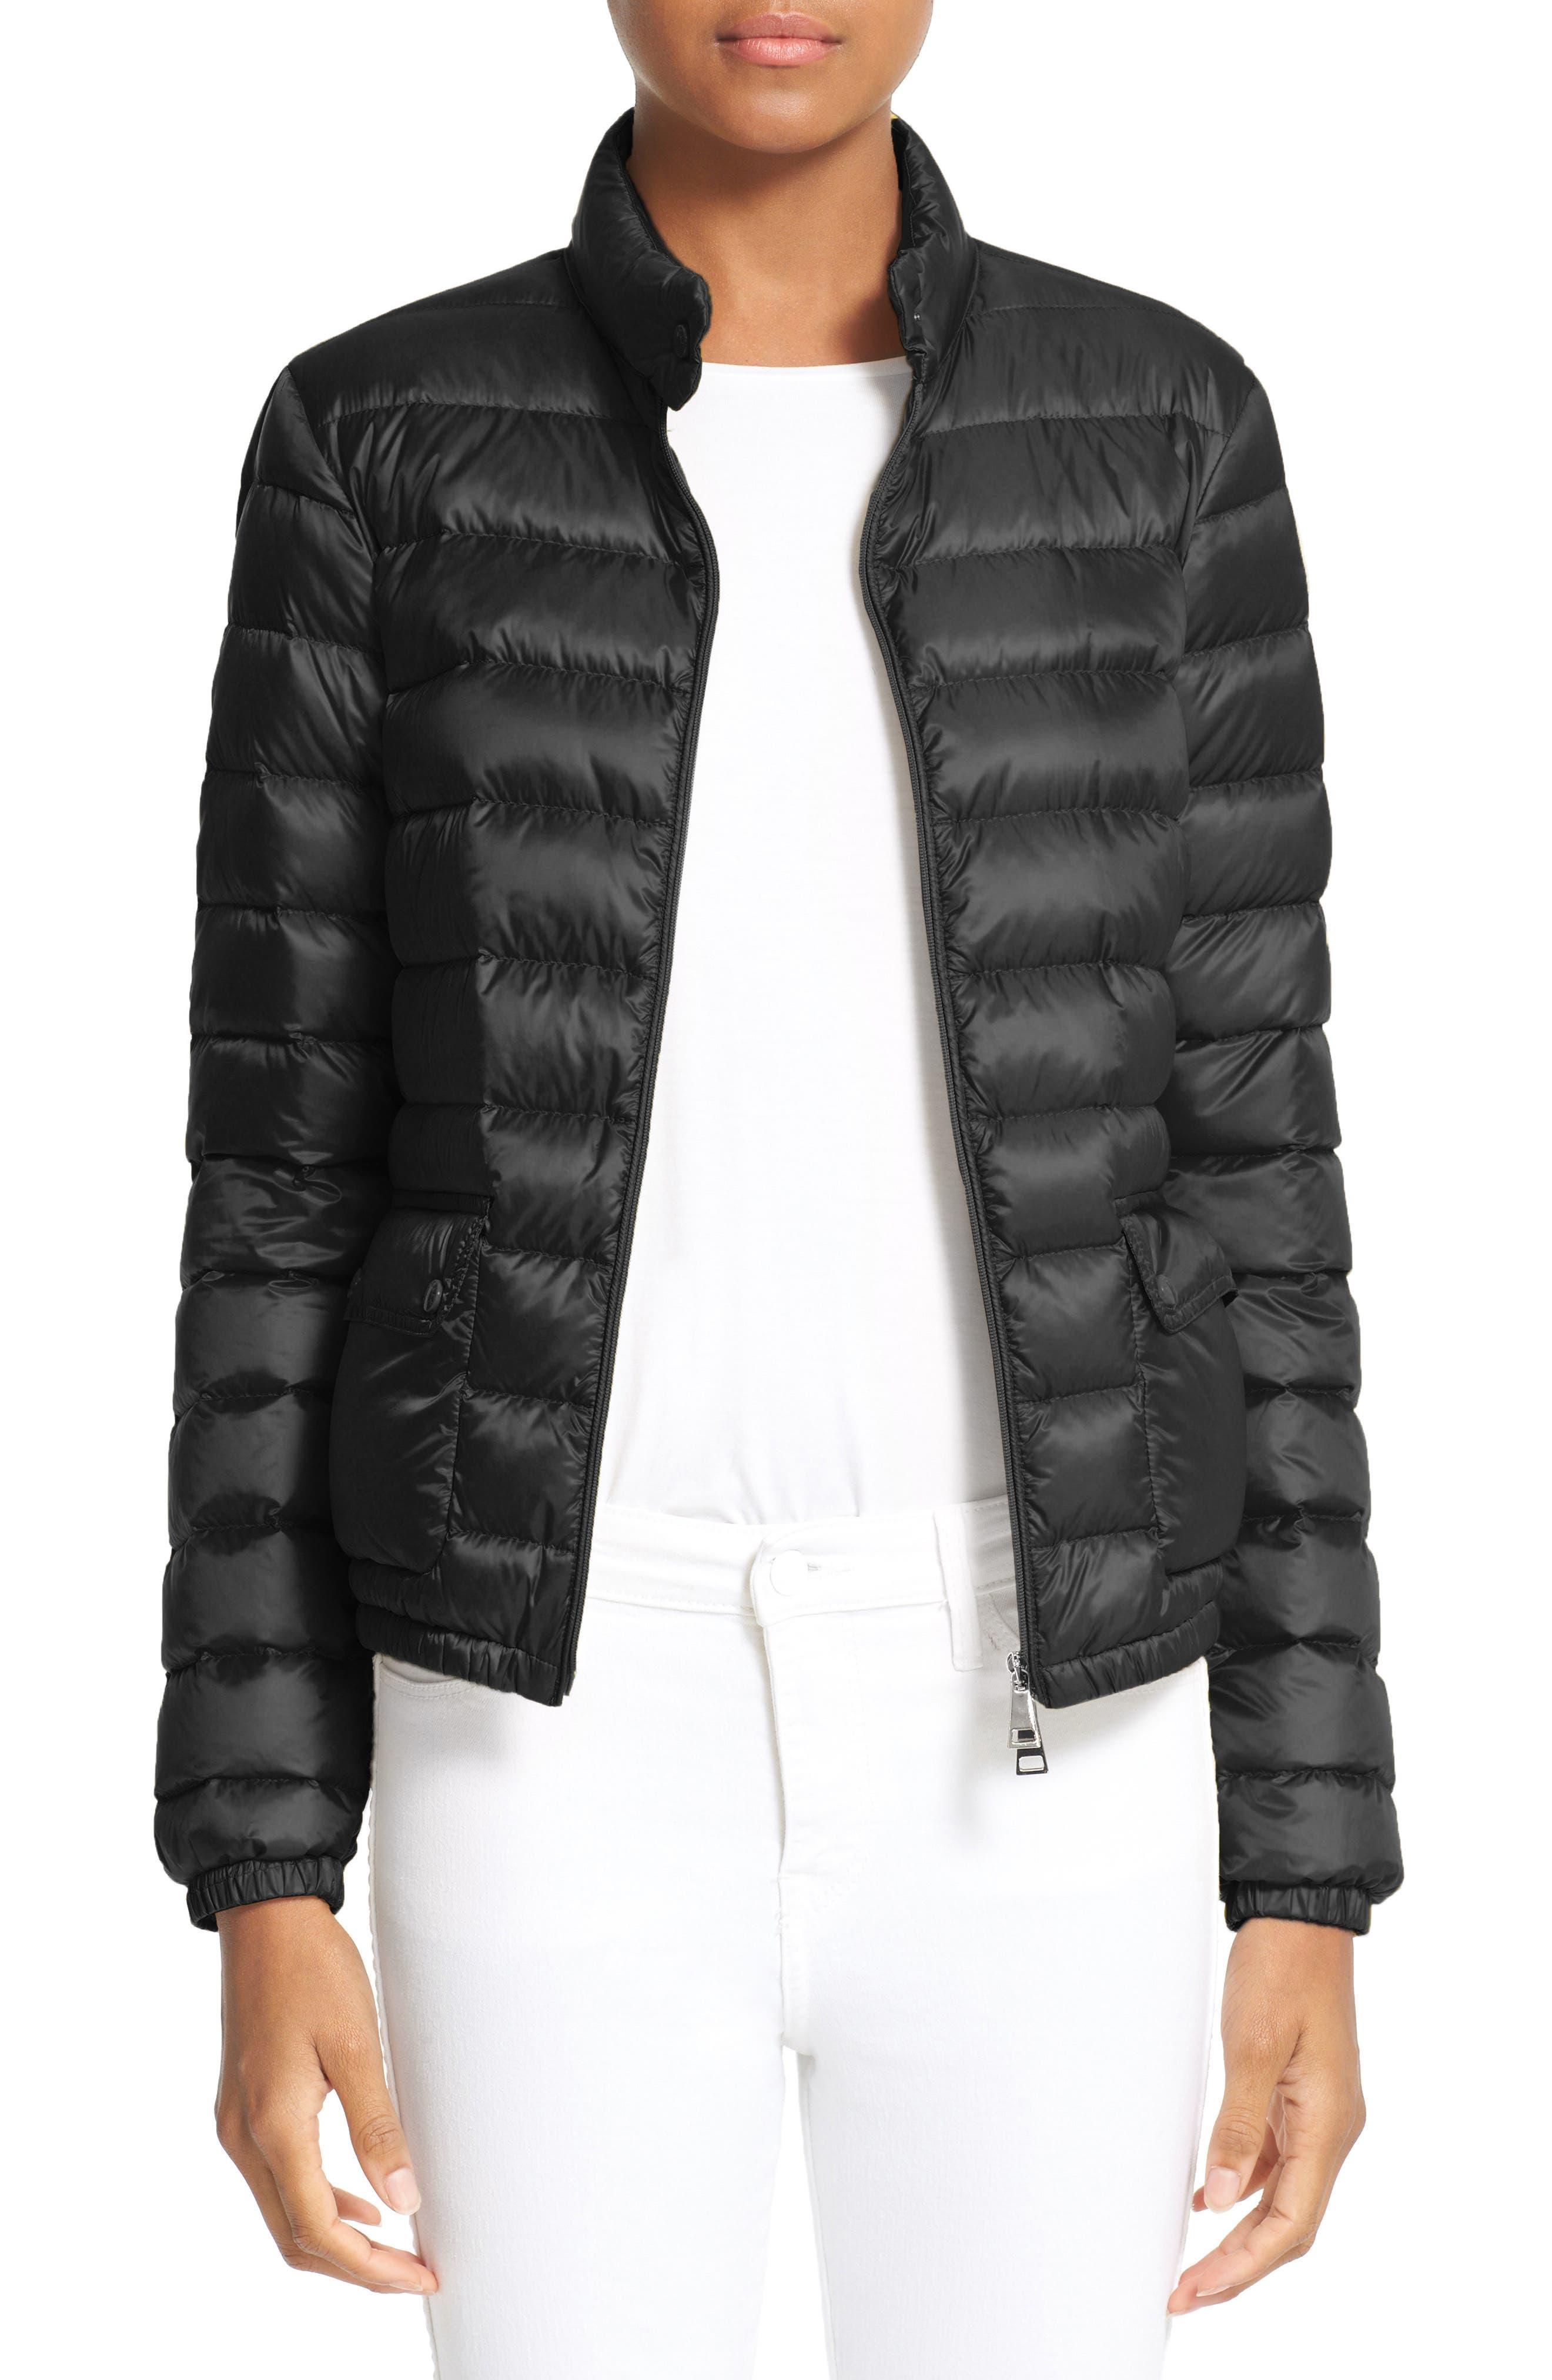 Main Image - Moncler 'Lans' Water Resistant Short Down Jacket